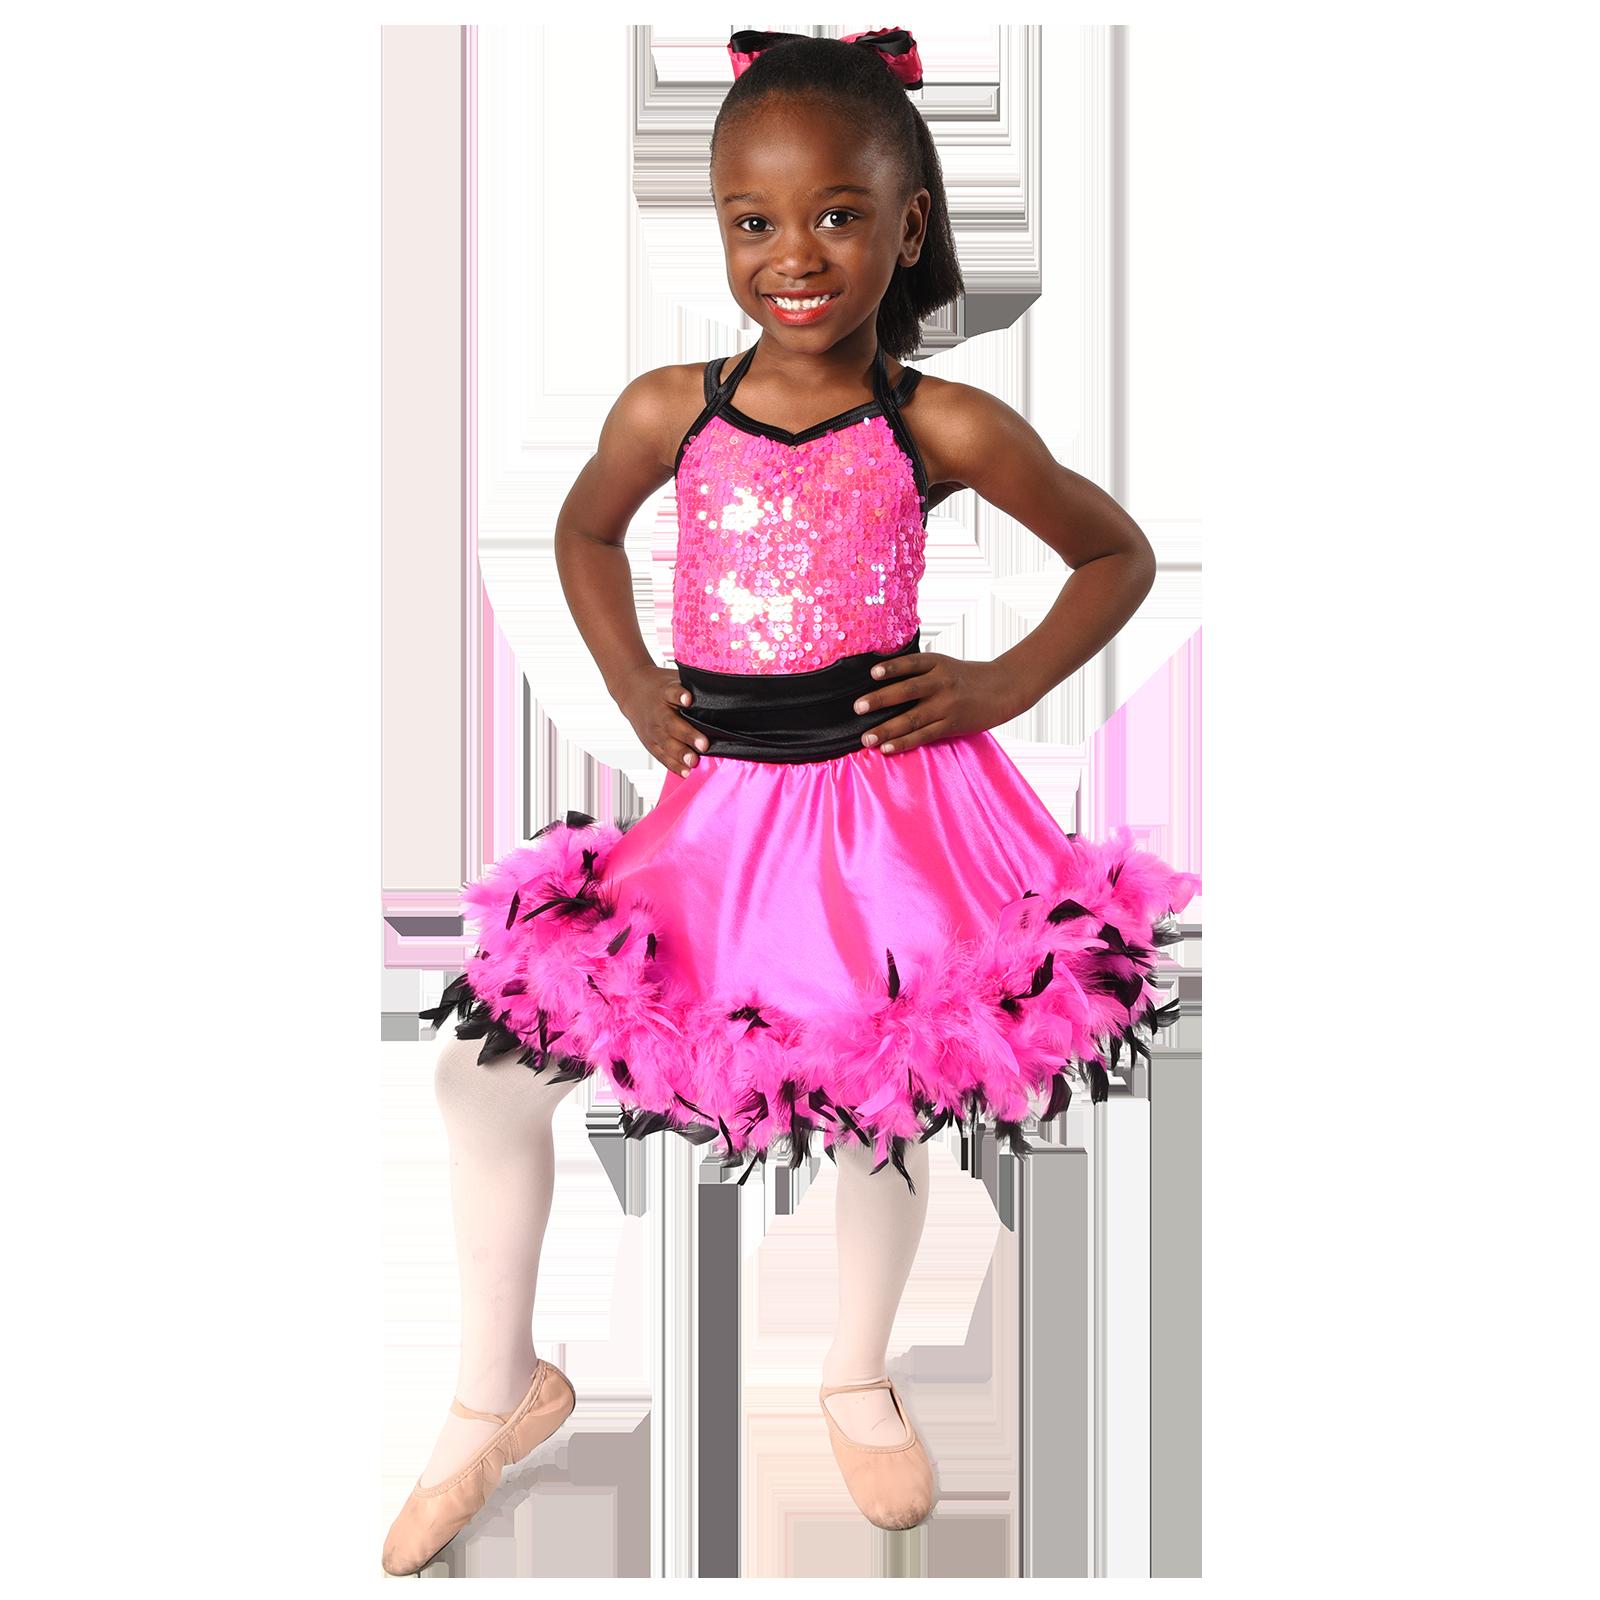 young African American girl ballerina dancer in costume